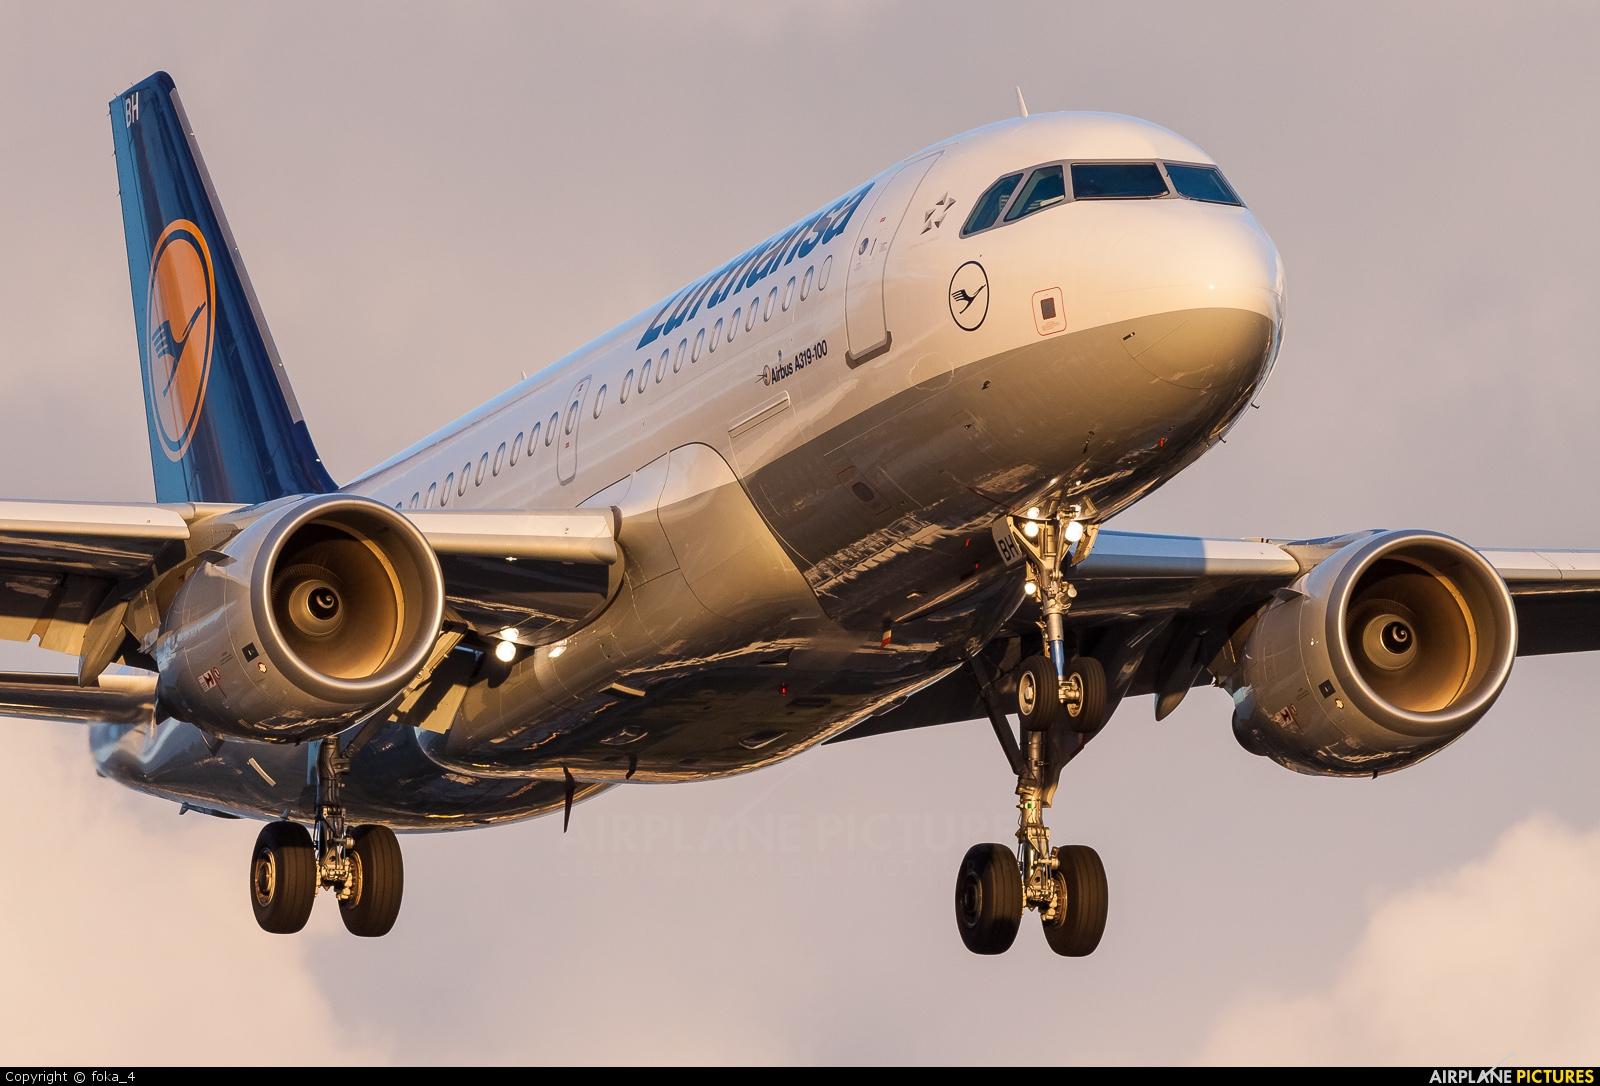 Lufthansa D-AIBH aircraft at Frankfurt